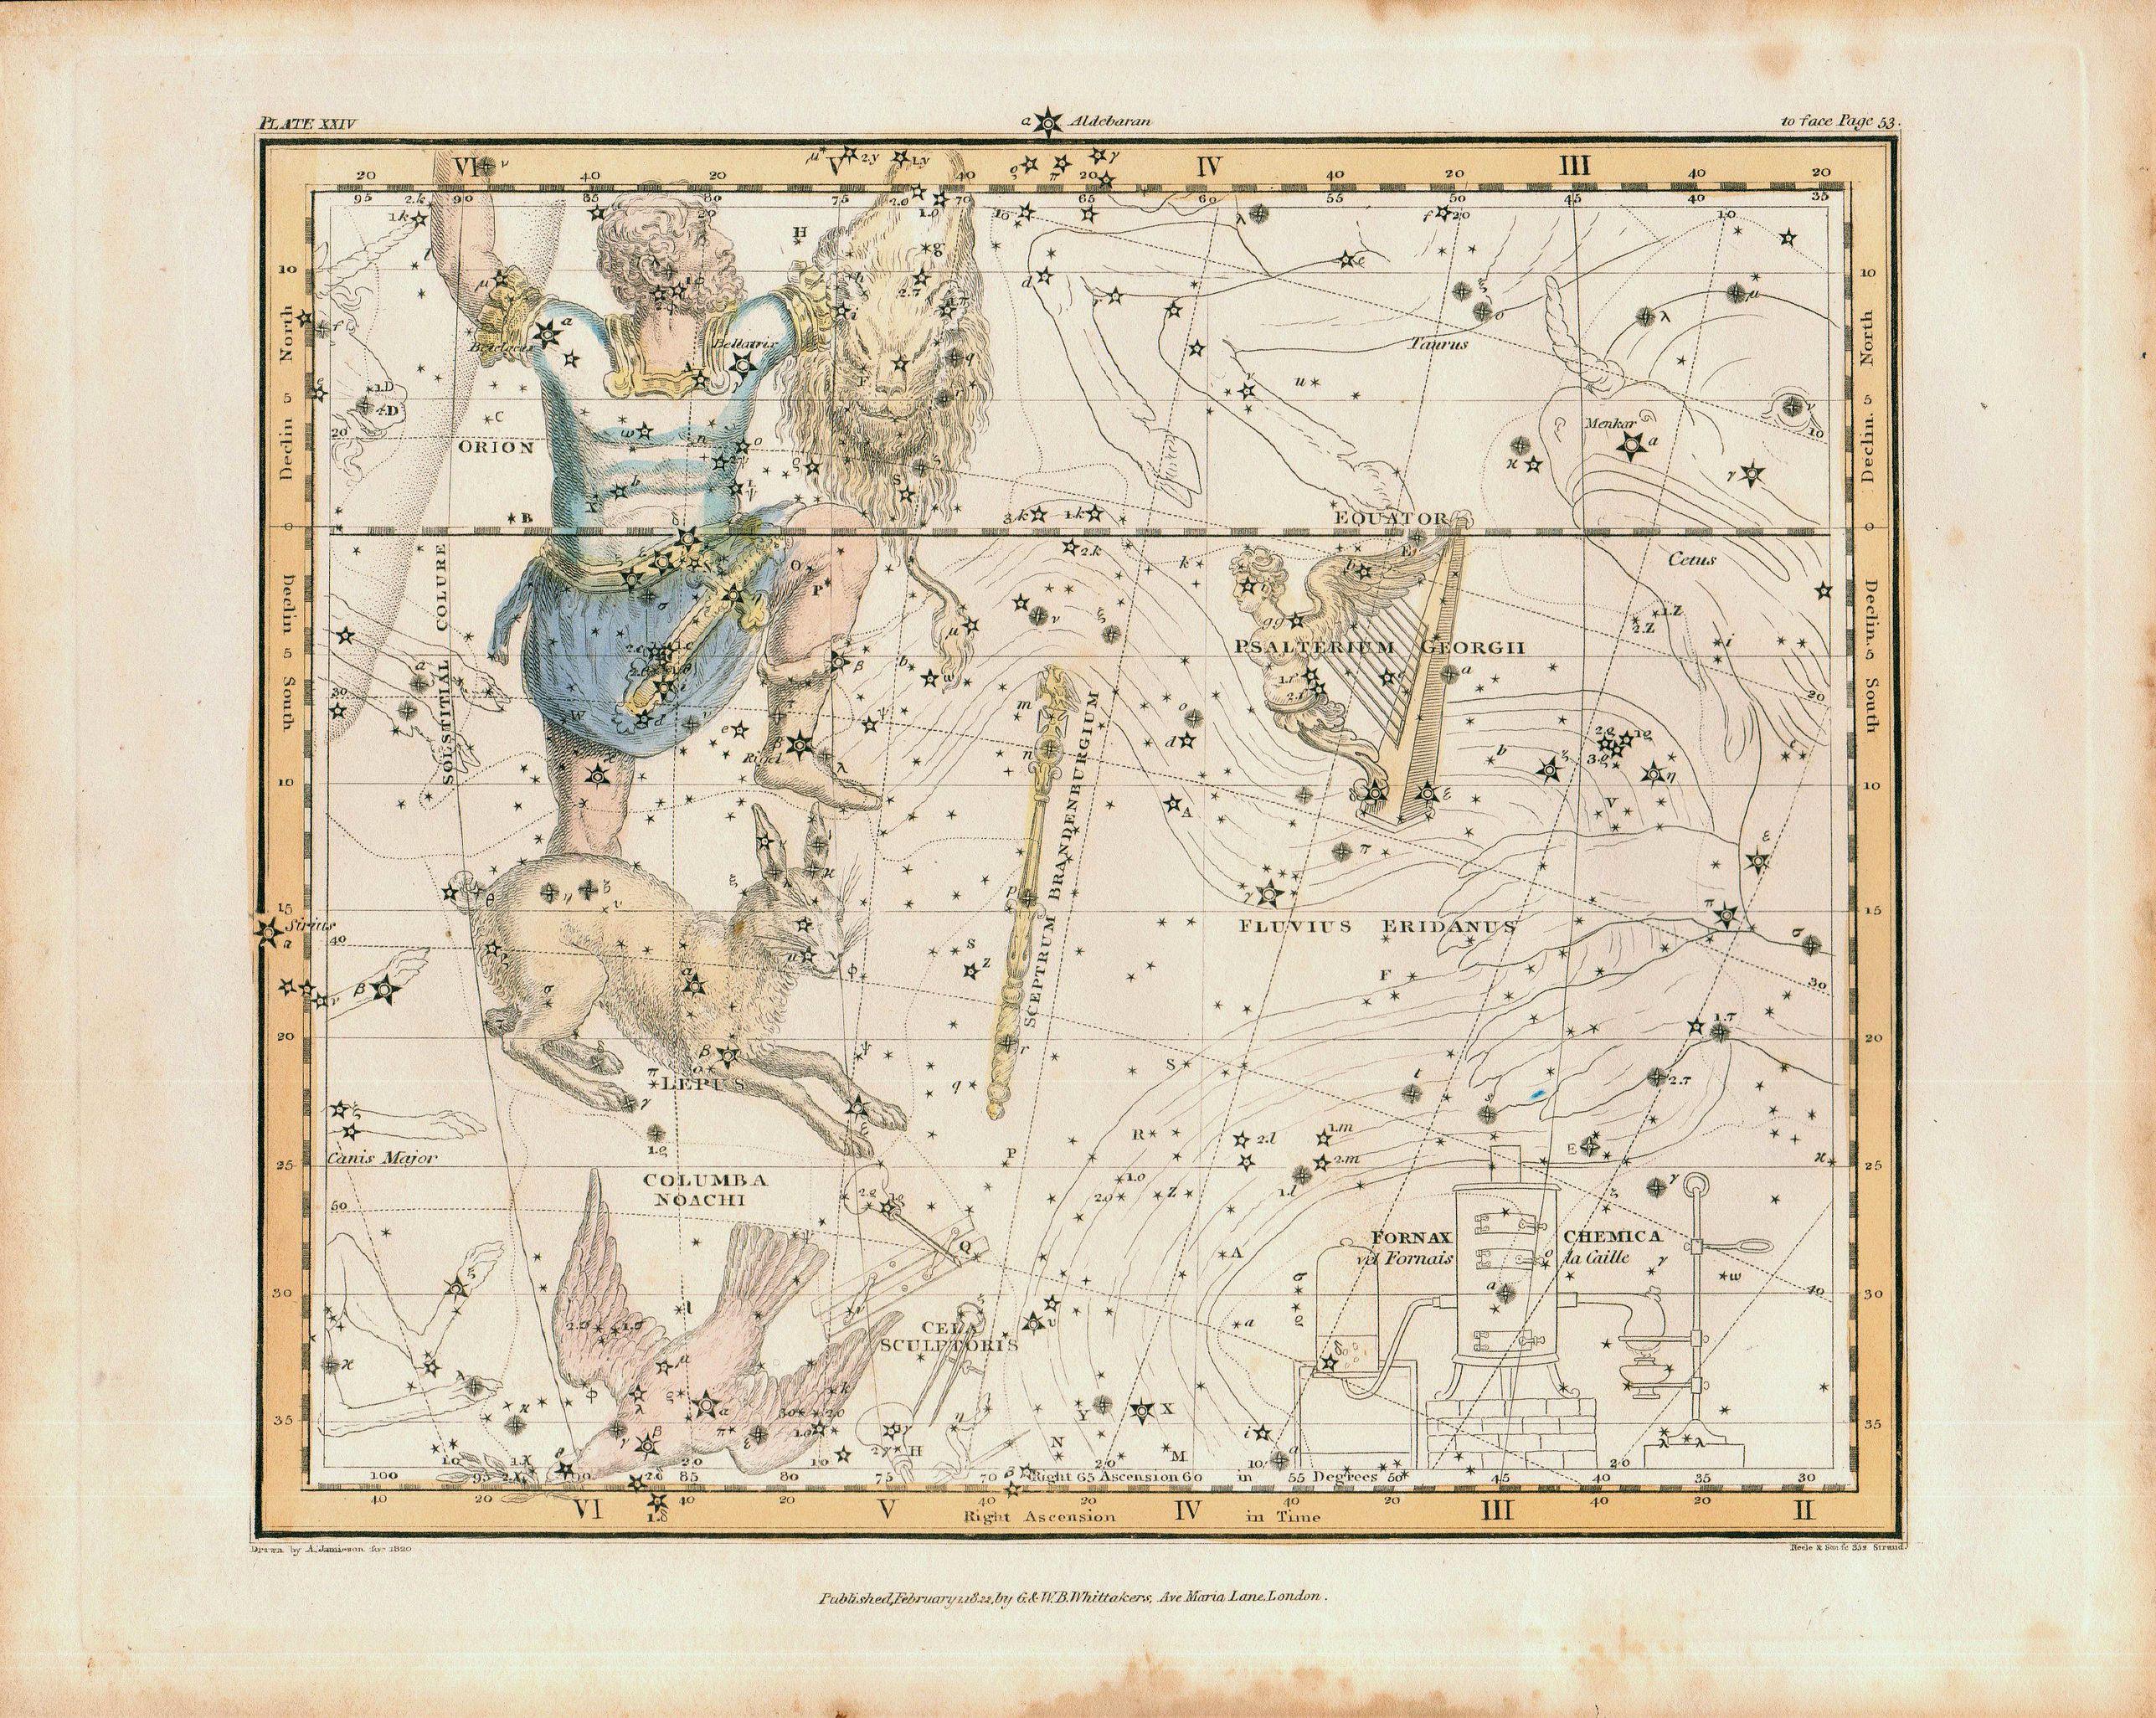 JAMIESON, Alexander - Jamieson Celestial chart plate 24, first edition.